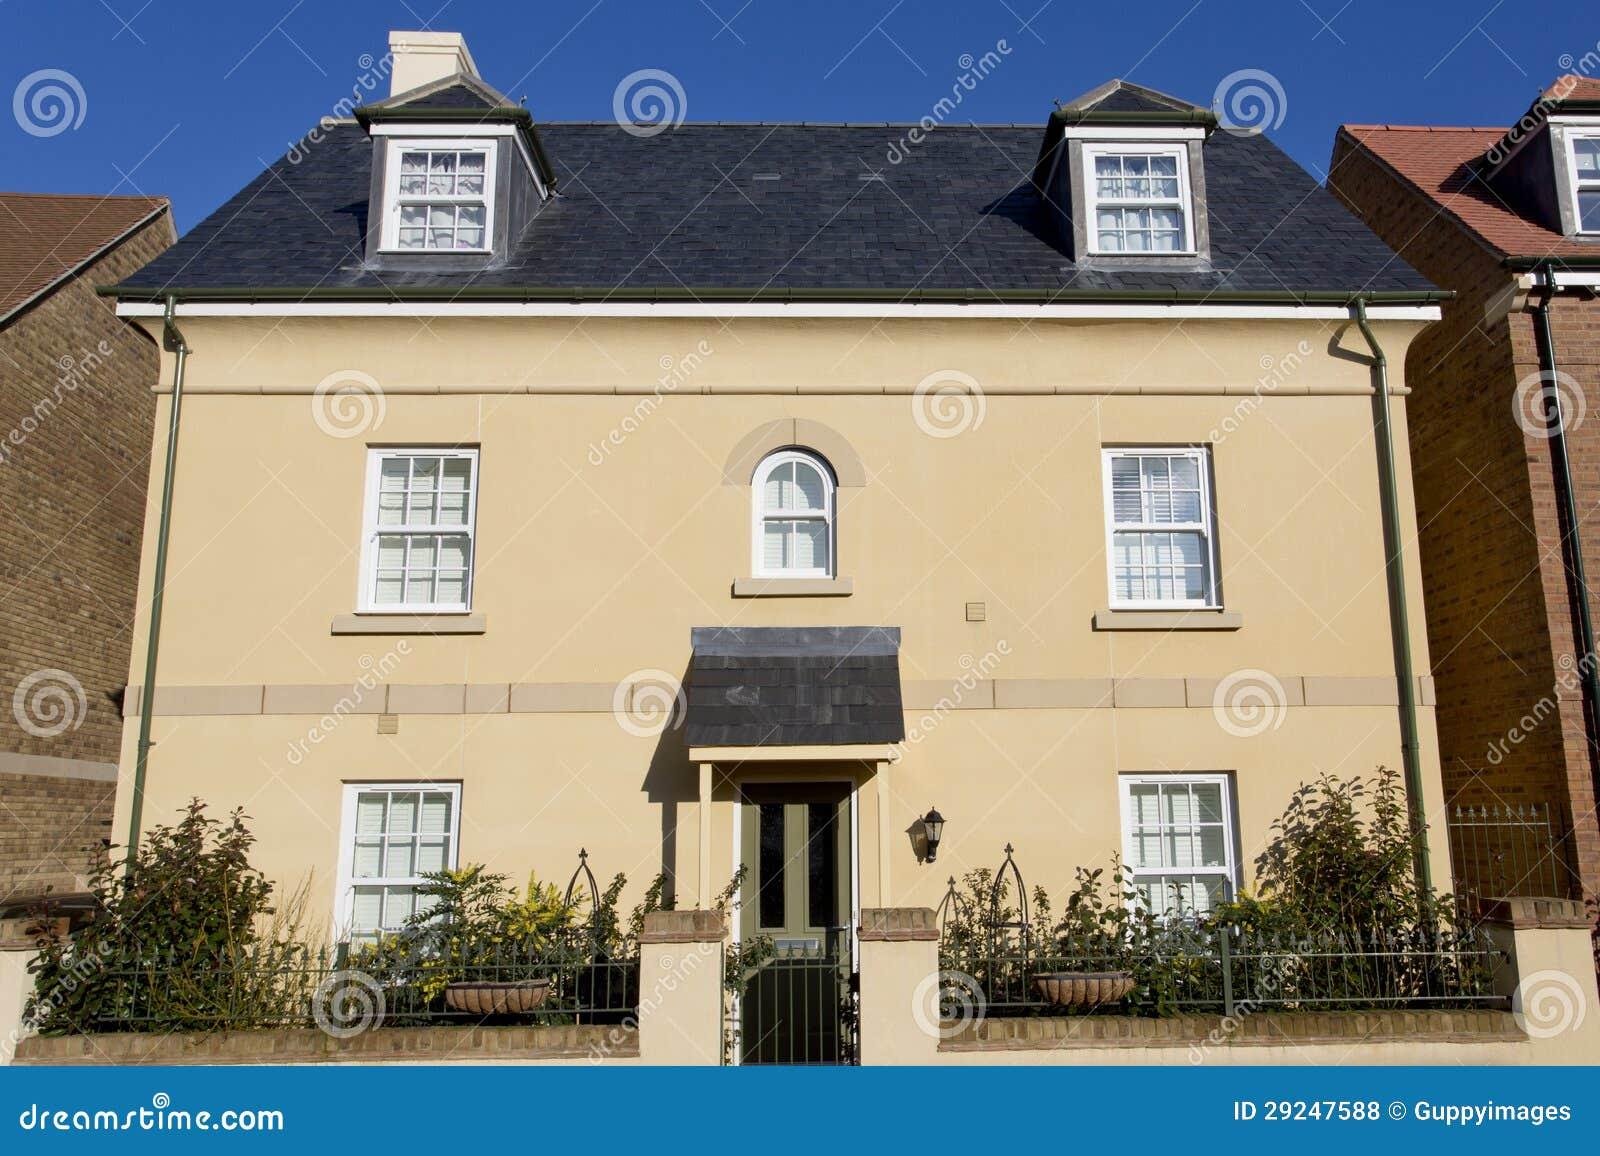 Download Casa destacada Rendered foto de stock. Imagem de residência - 29247588